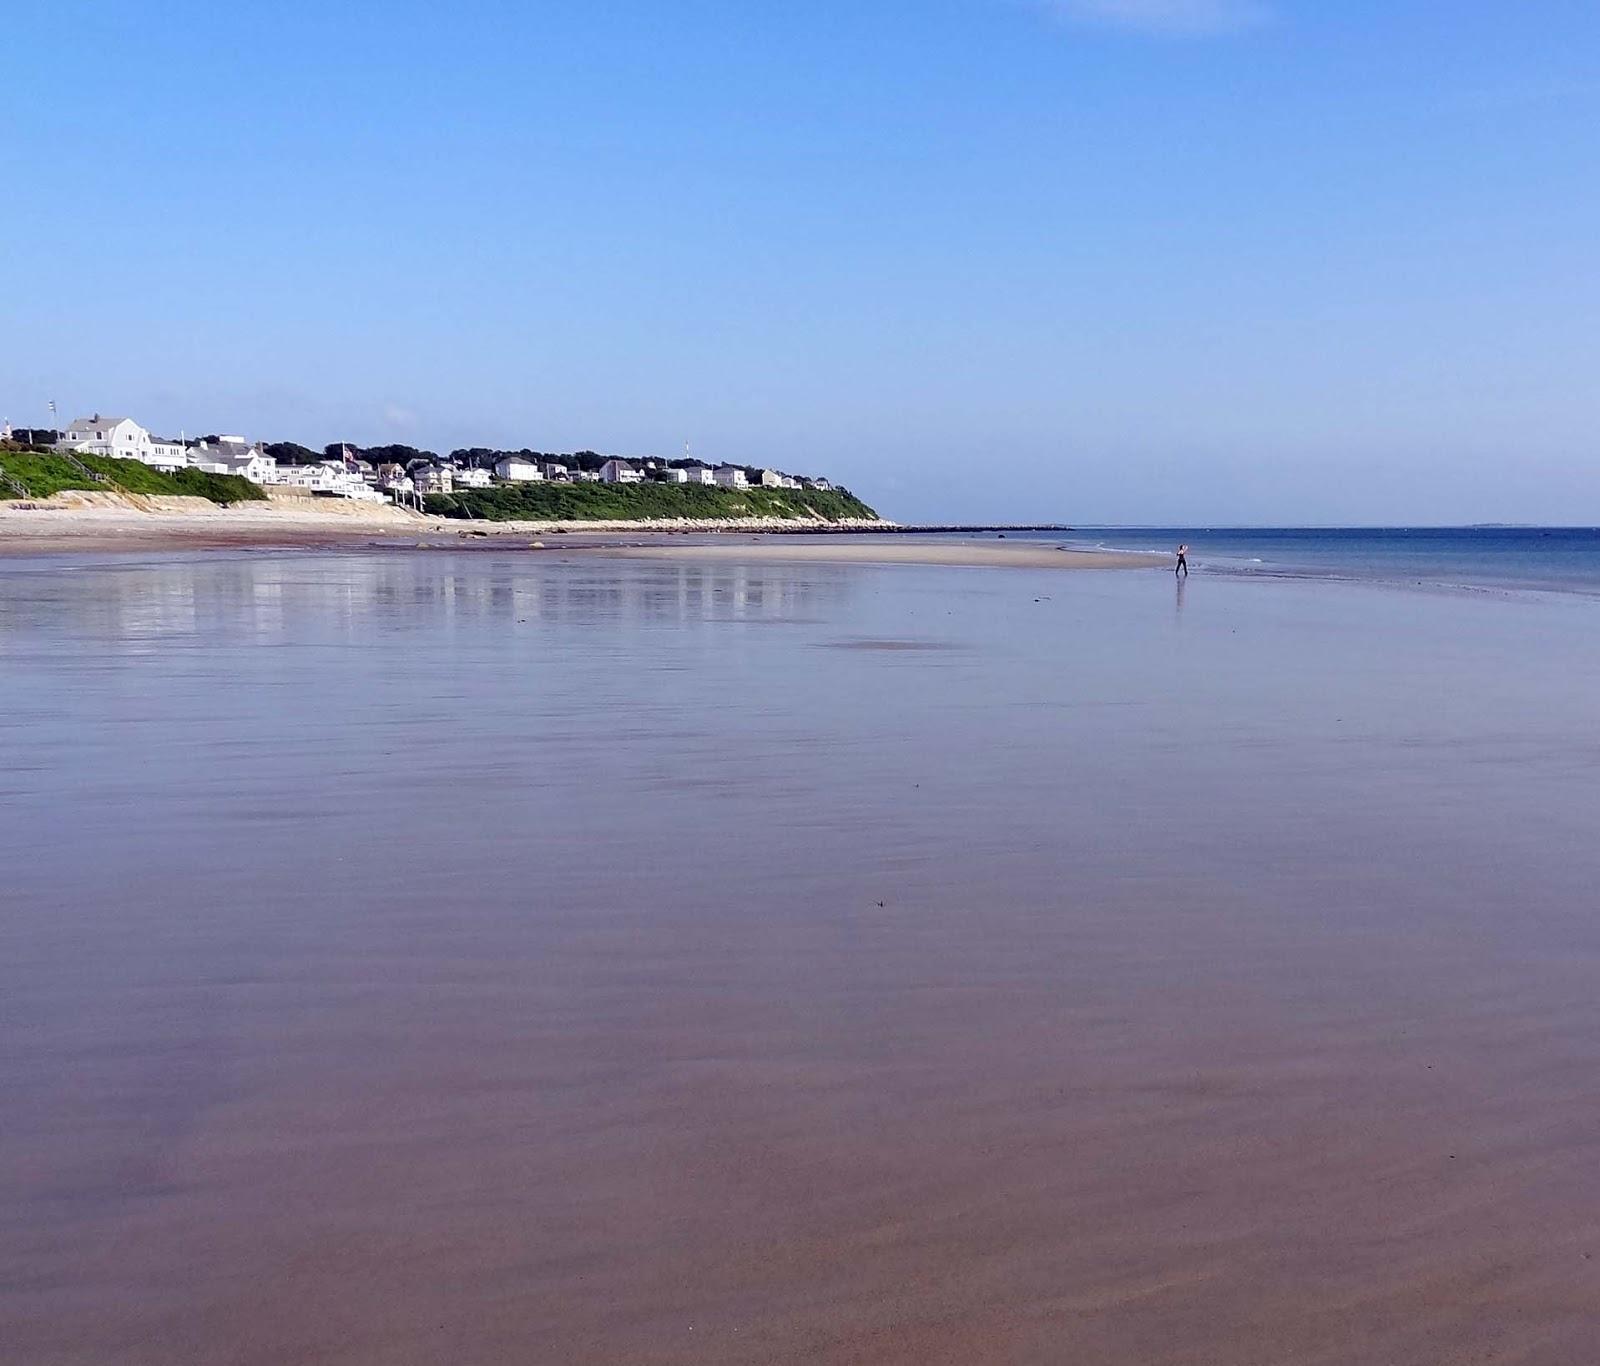 Joes retirement blog low tide white horse beach manomet low tide white horse beach manomet plymouth massachusetts usa nvjuhfo Choice Image